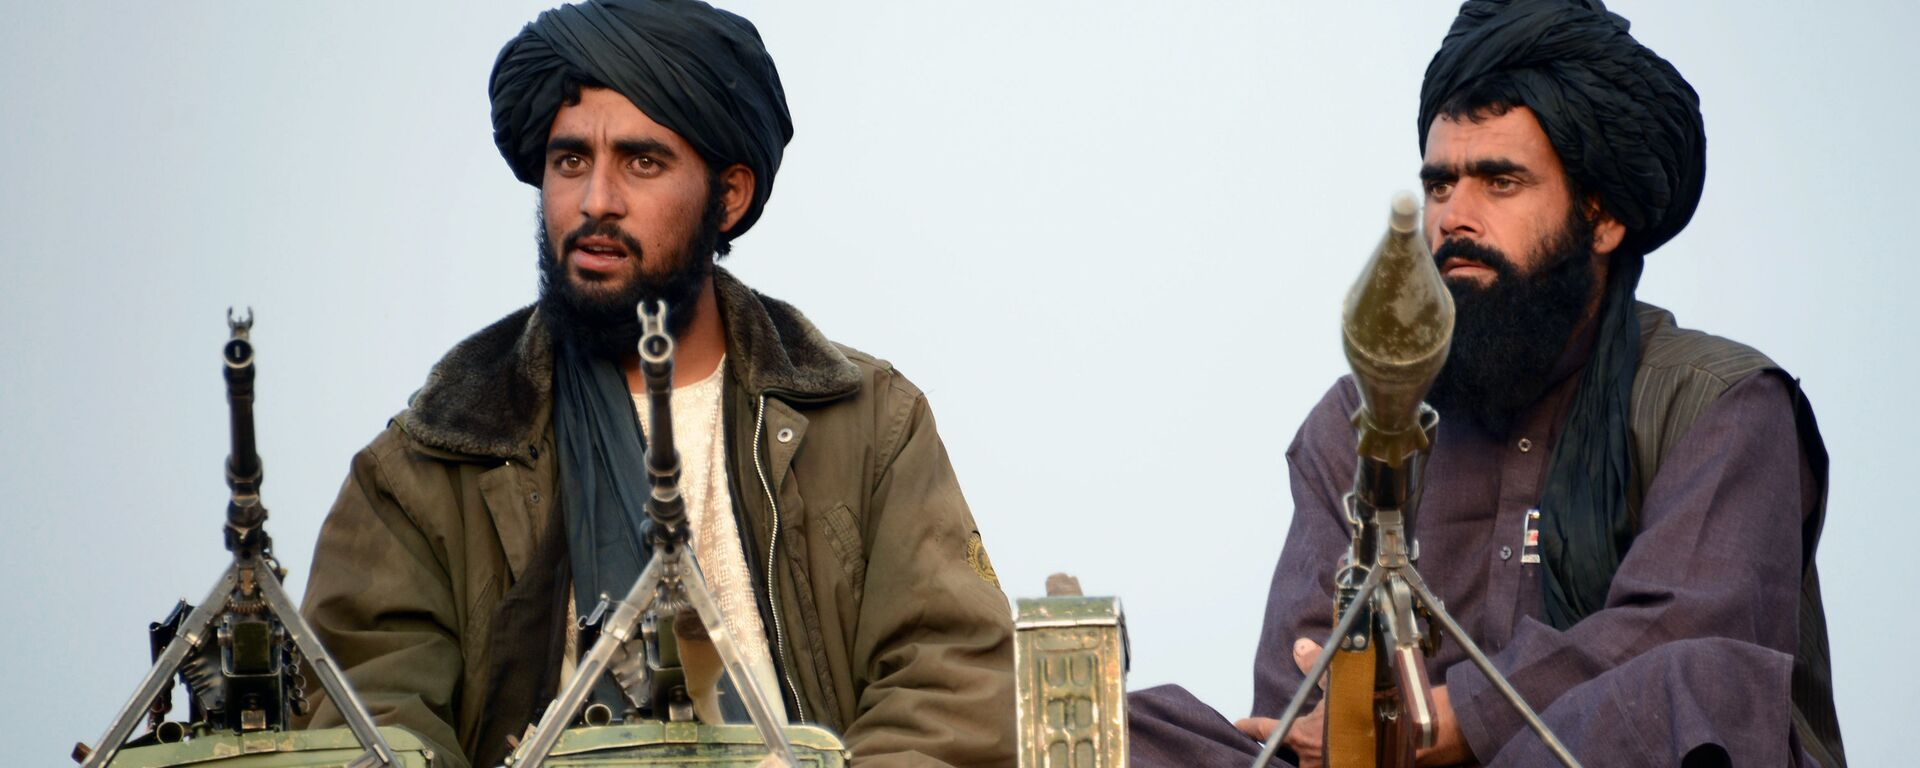 Боевики движения Талибан, архивное фото - Sputnik Тоҷикистон, 1920, 24.06.2021